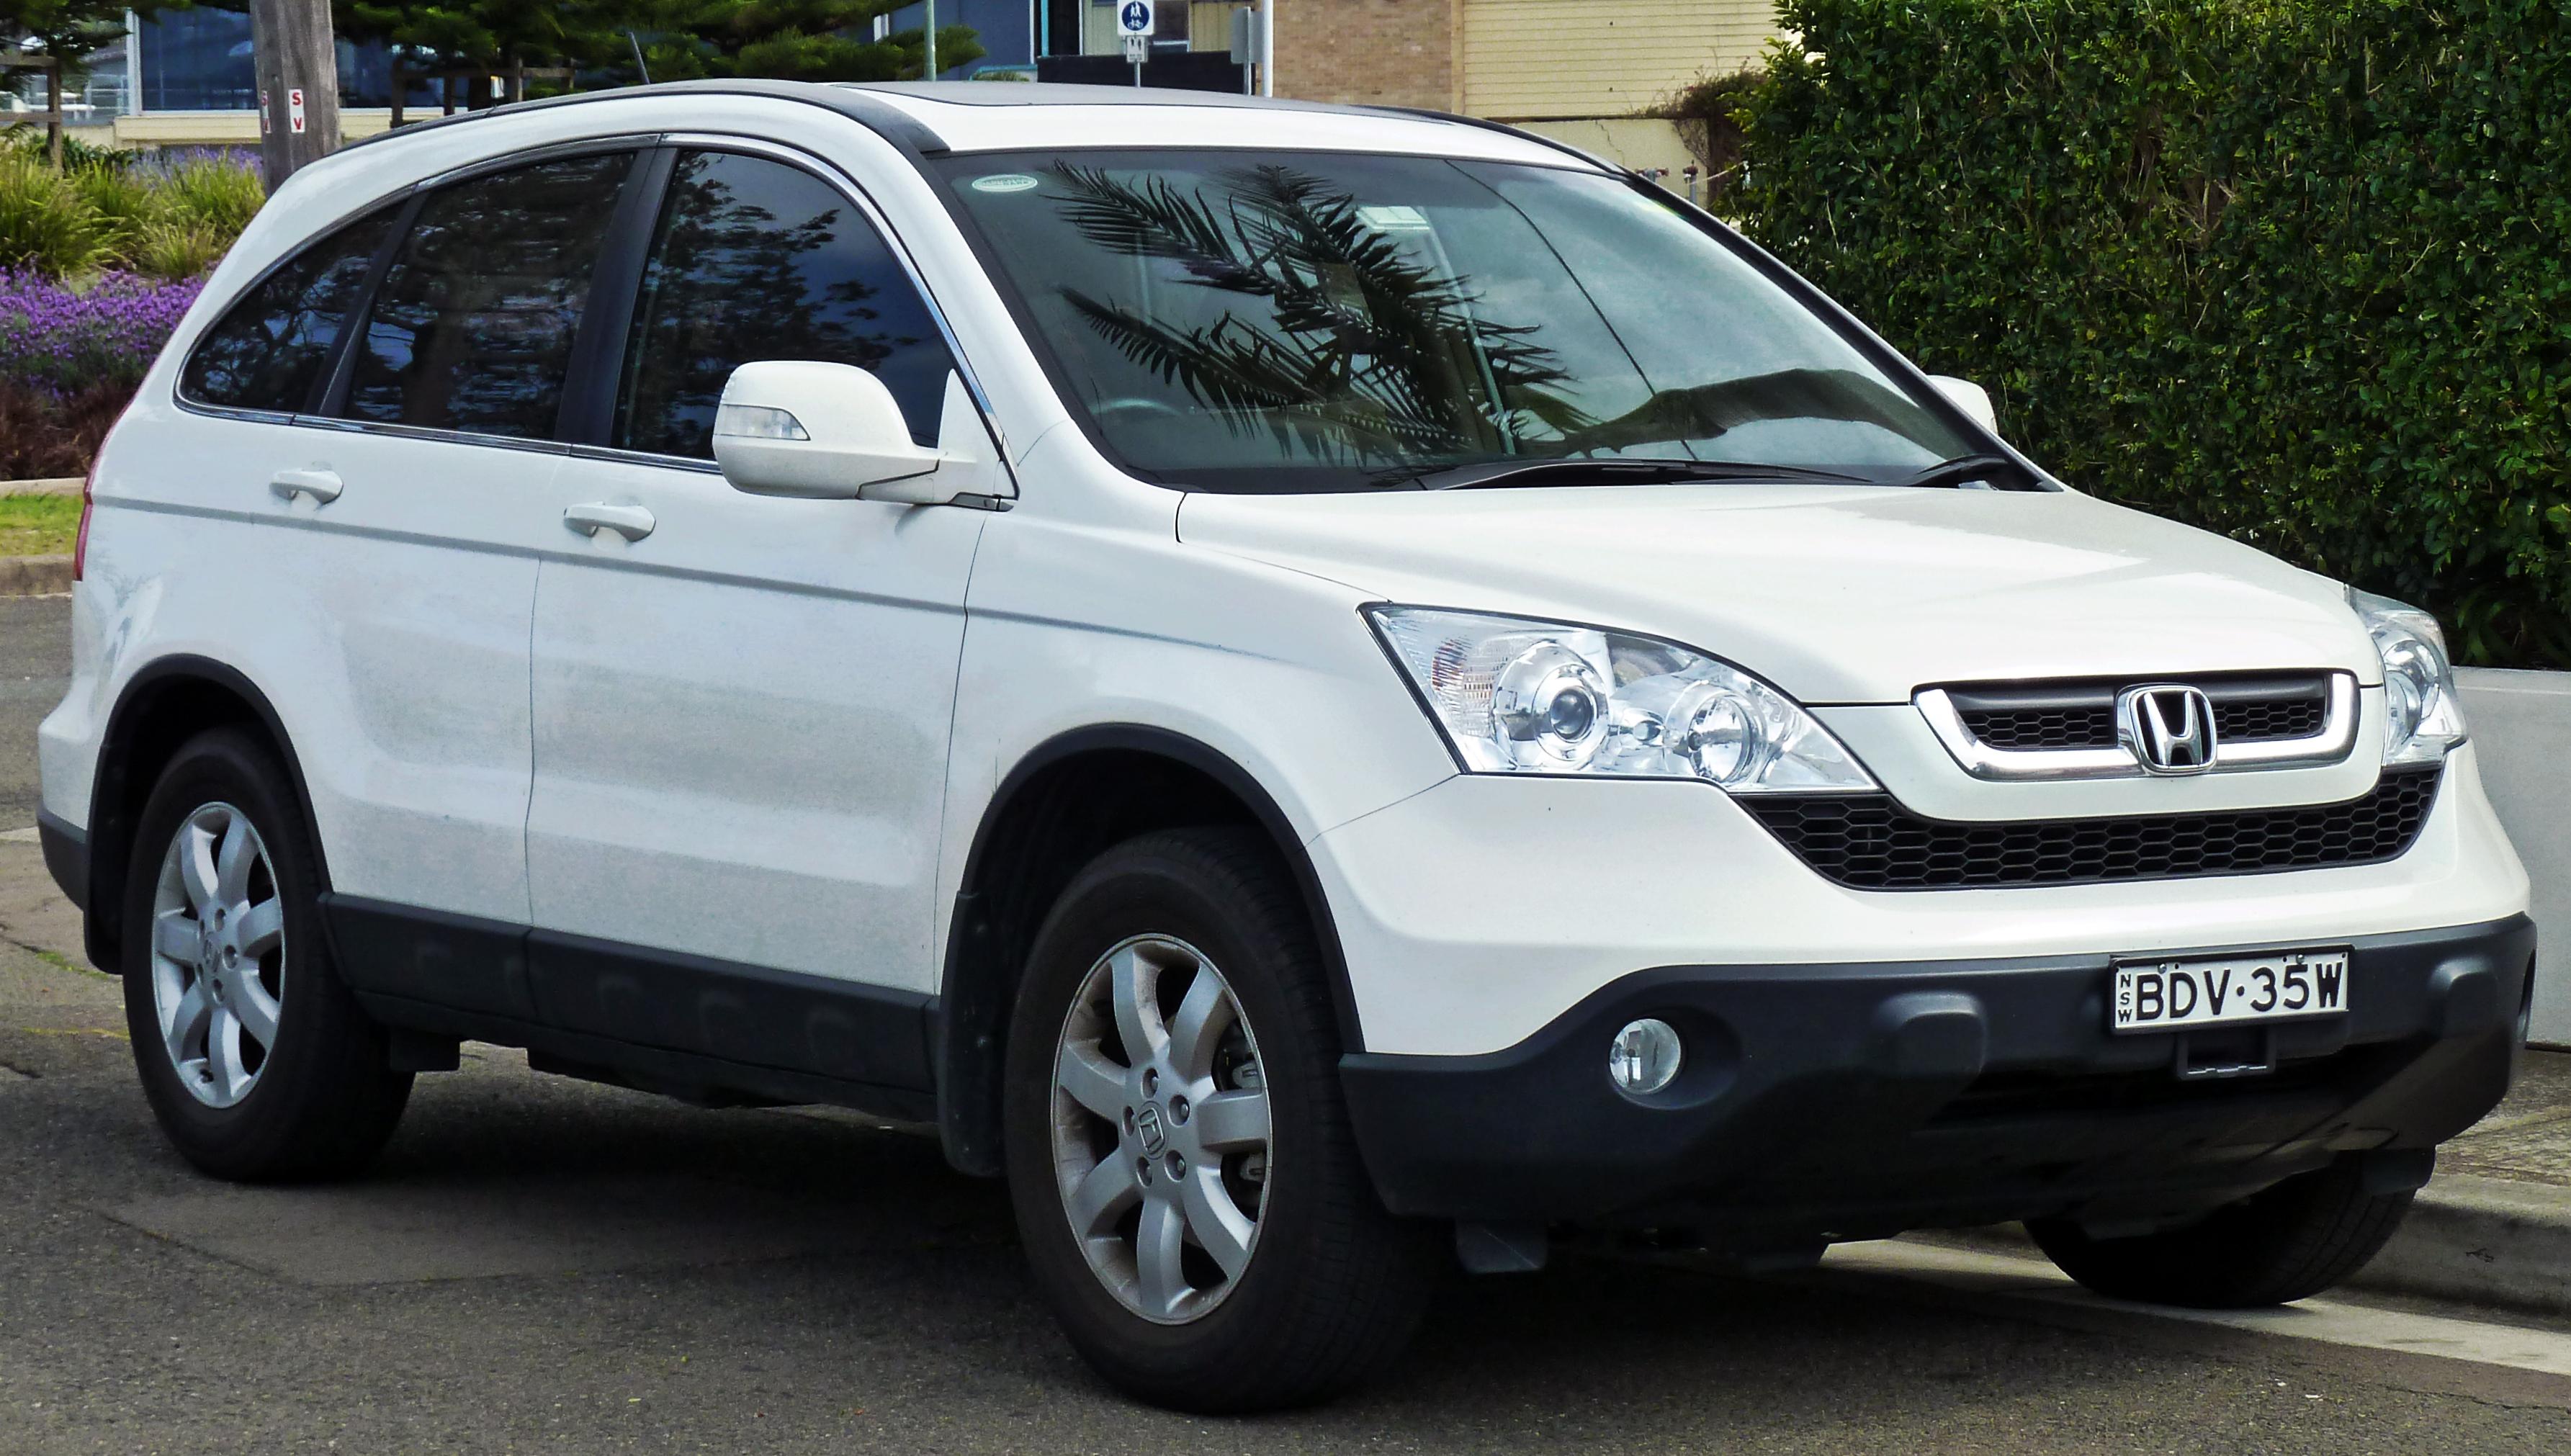 file 2007 2009 honda cr v re my2007 luxury wagon 02     wikimedia